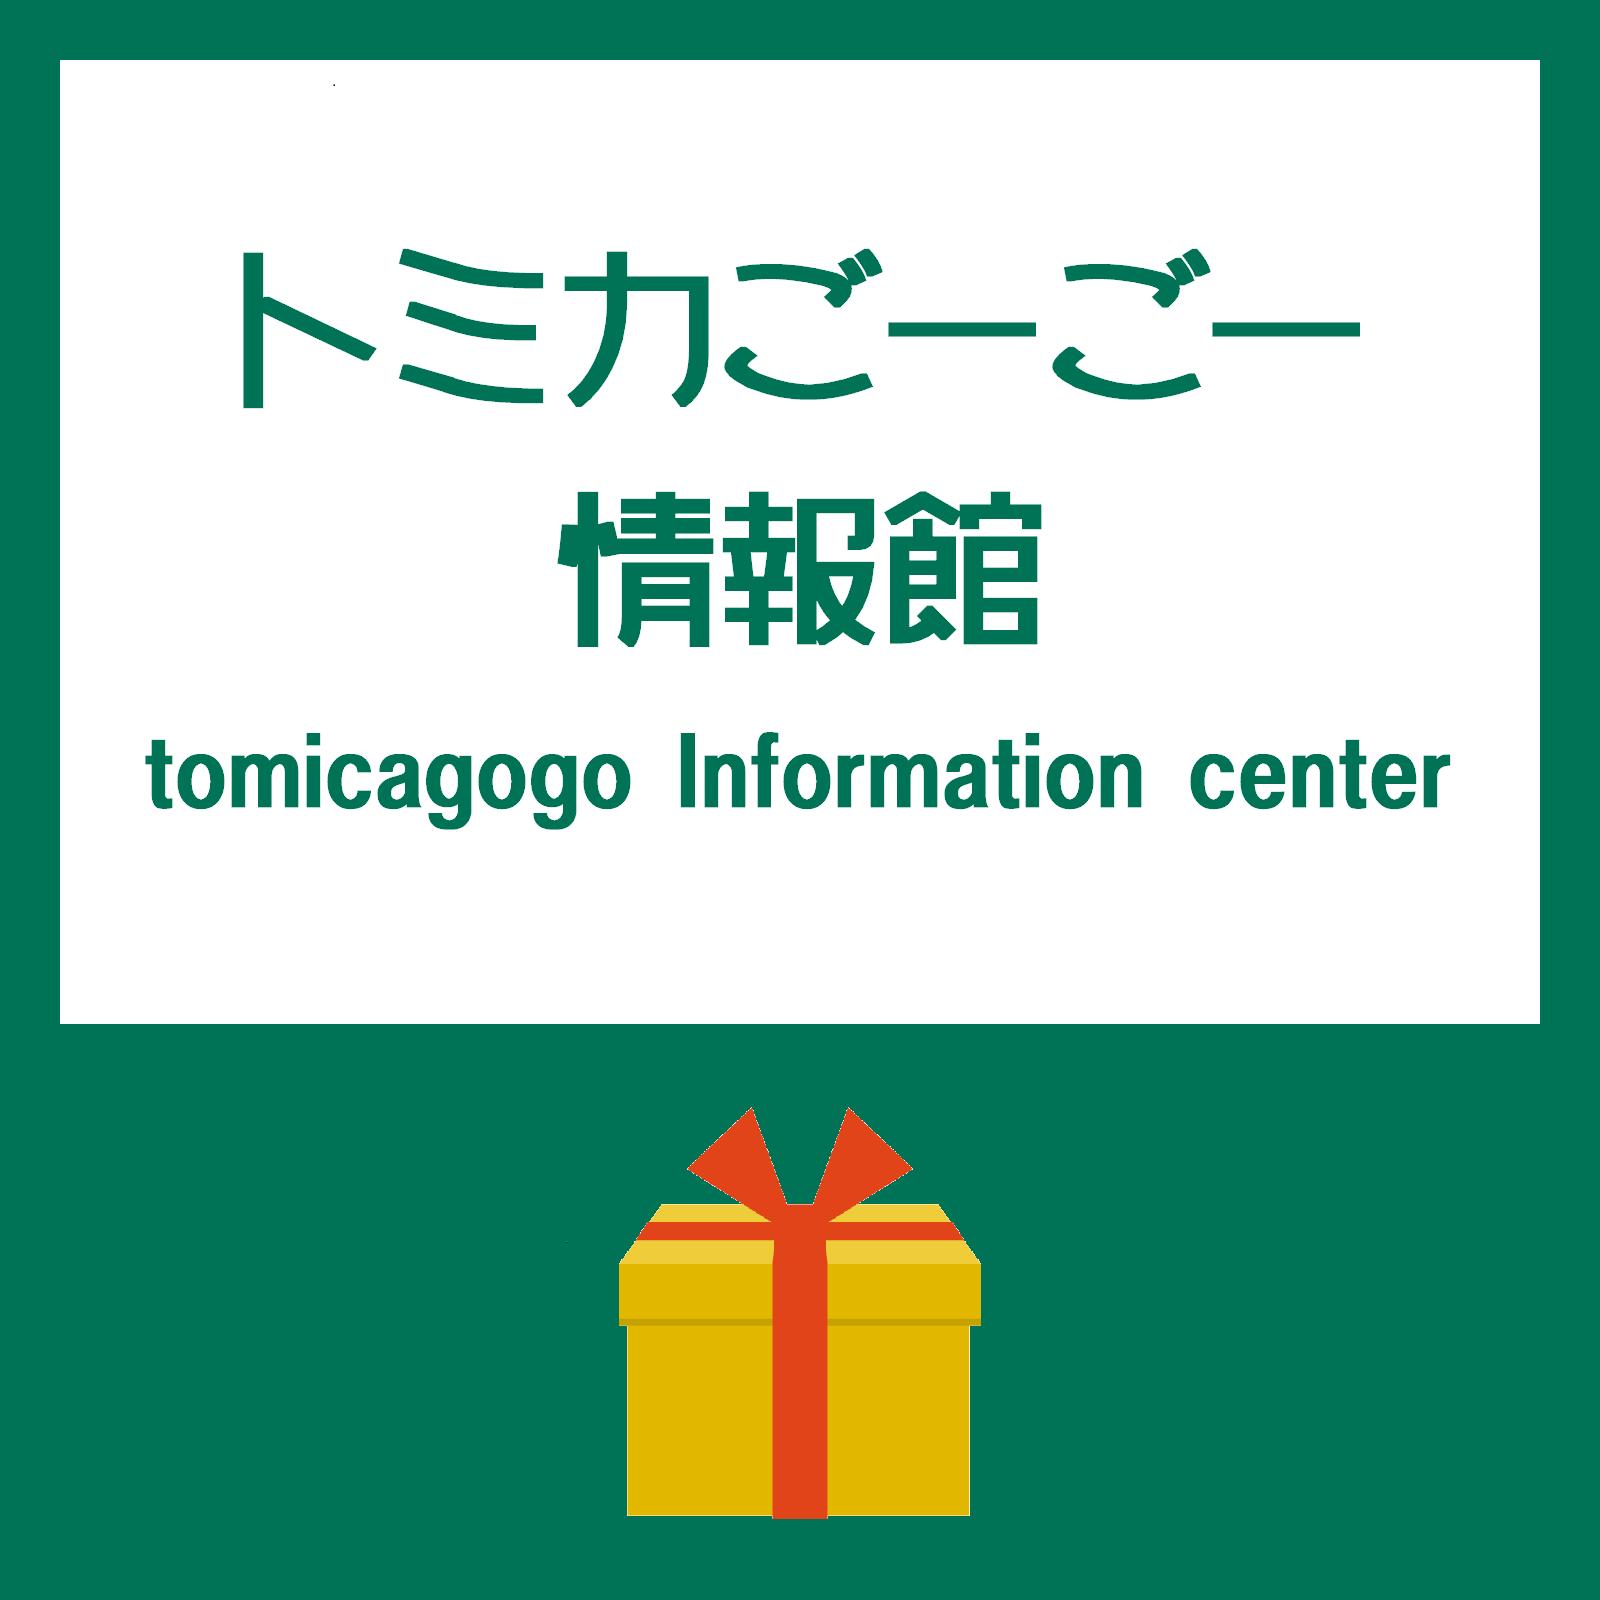 tomicagogo_icon_present_1200_1200.png